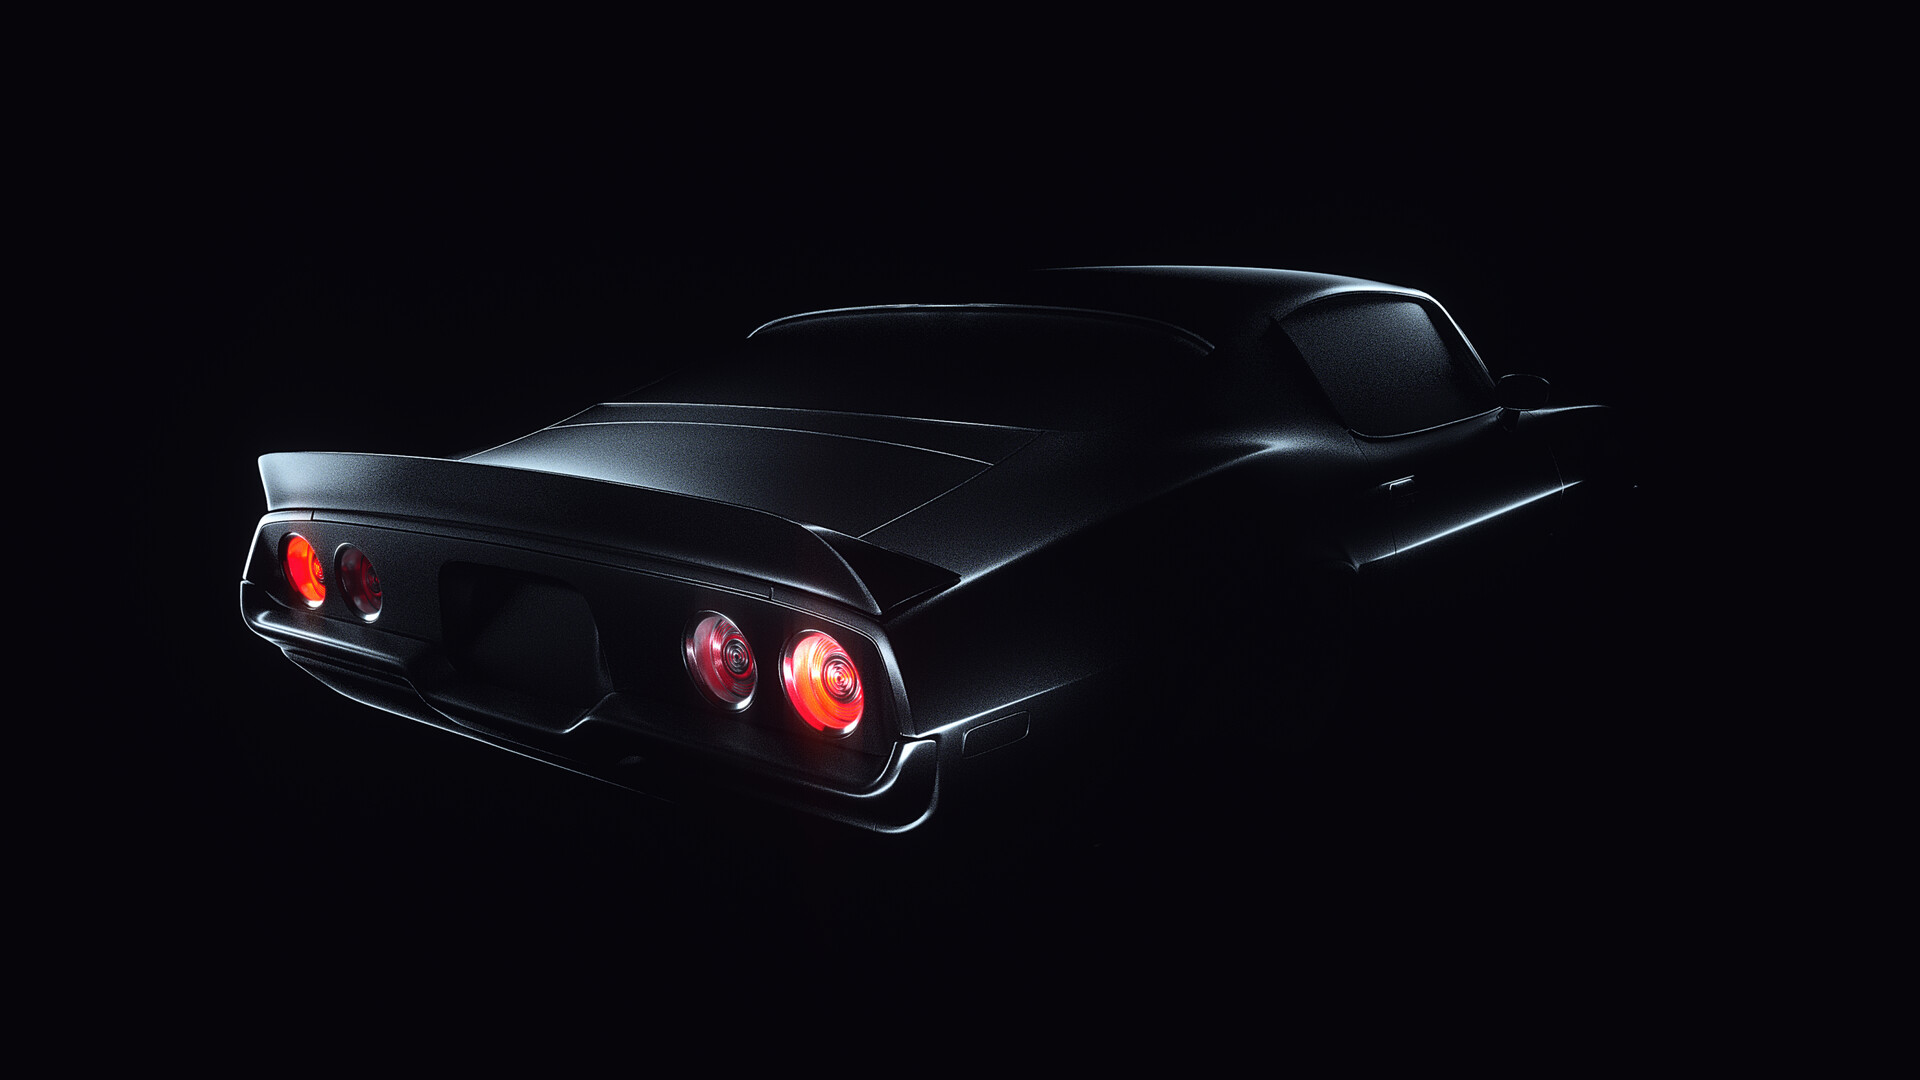 General 1920x1080 car black background lines digital art lights flashlight black shadow Chevrolet Camaro Camaro